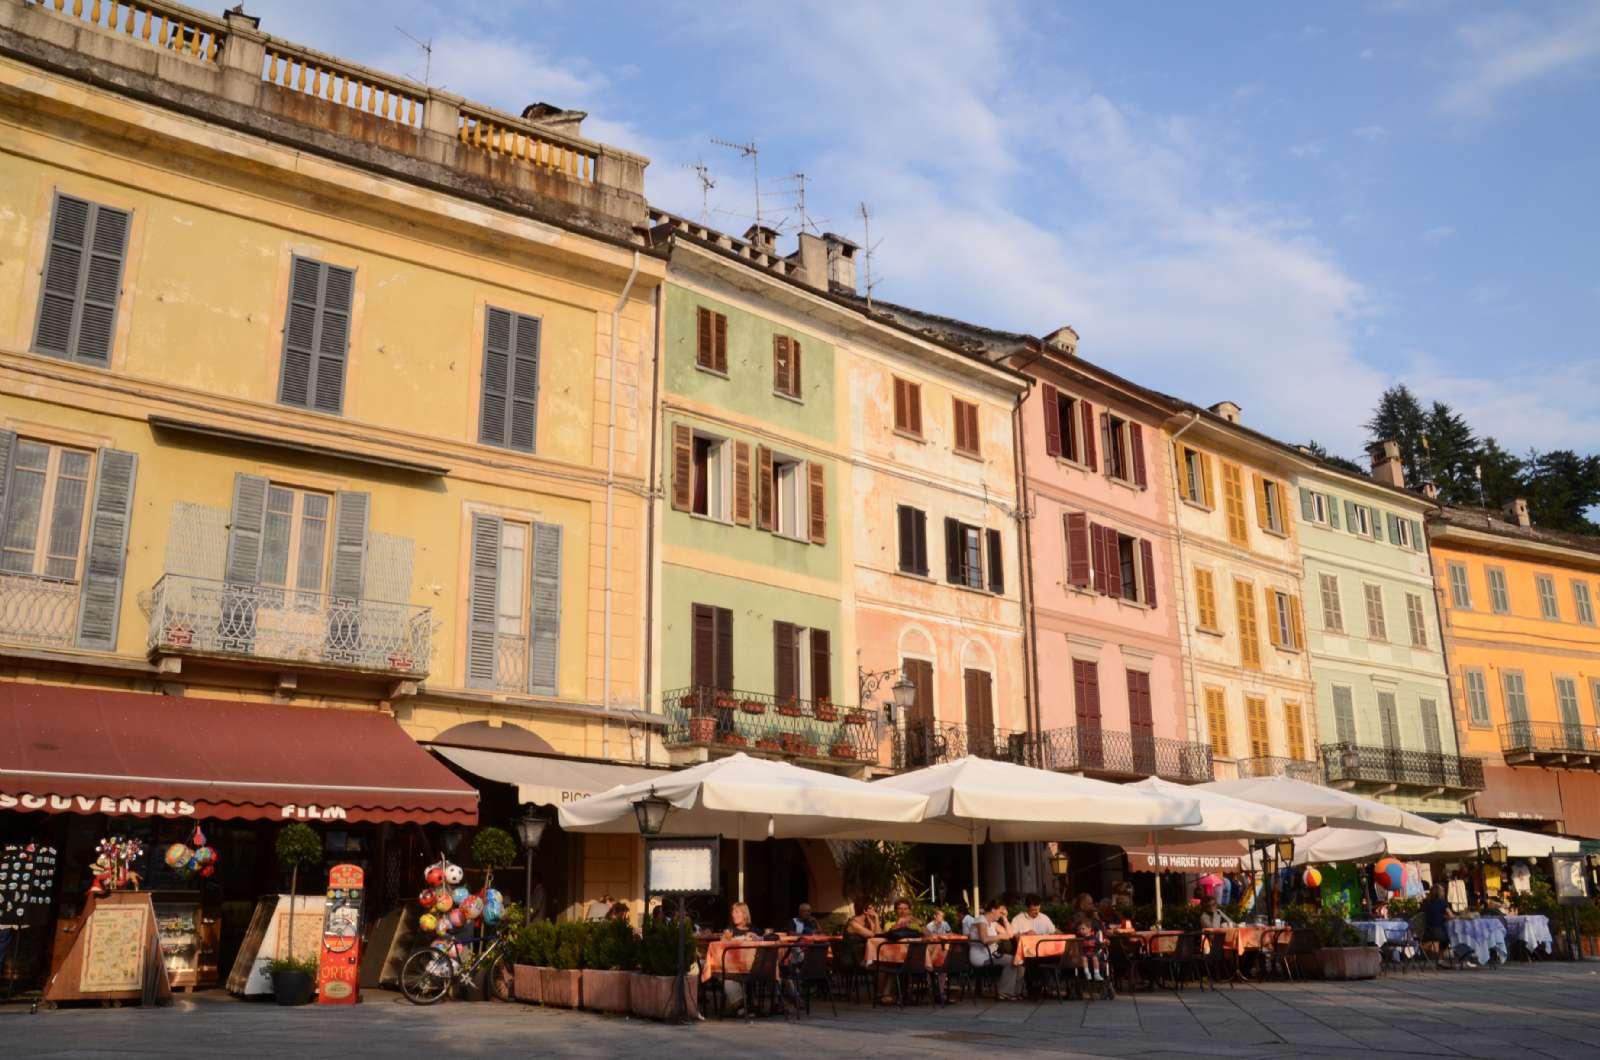 Det centrala torget 'Piazza Motta' i Orta San Giulio